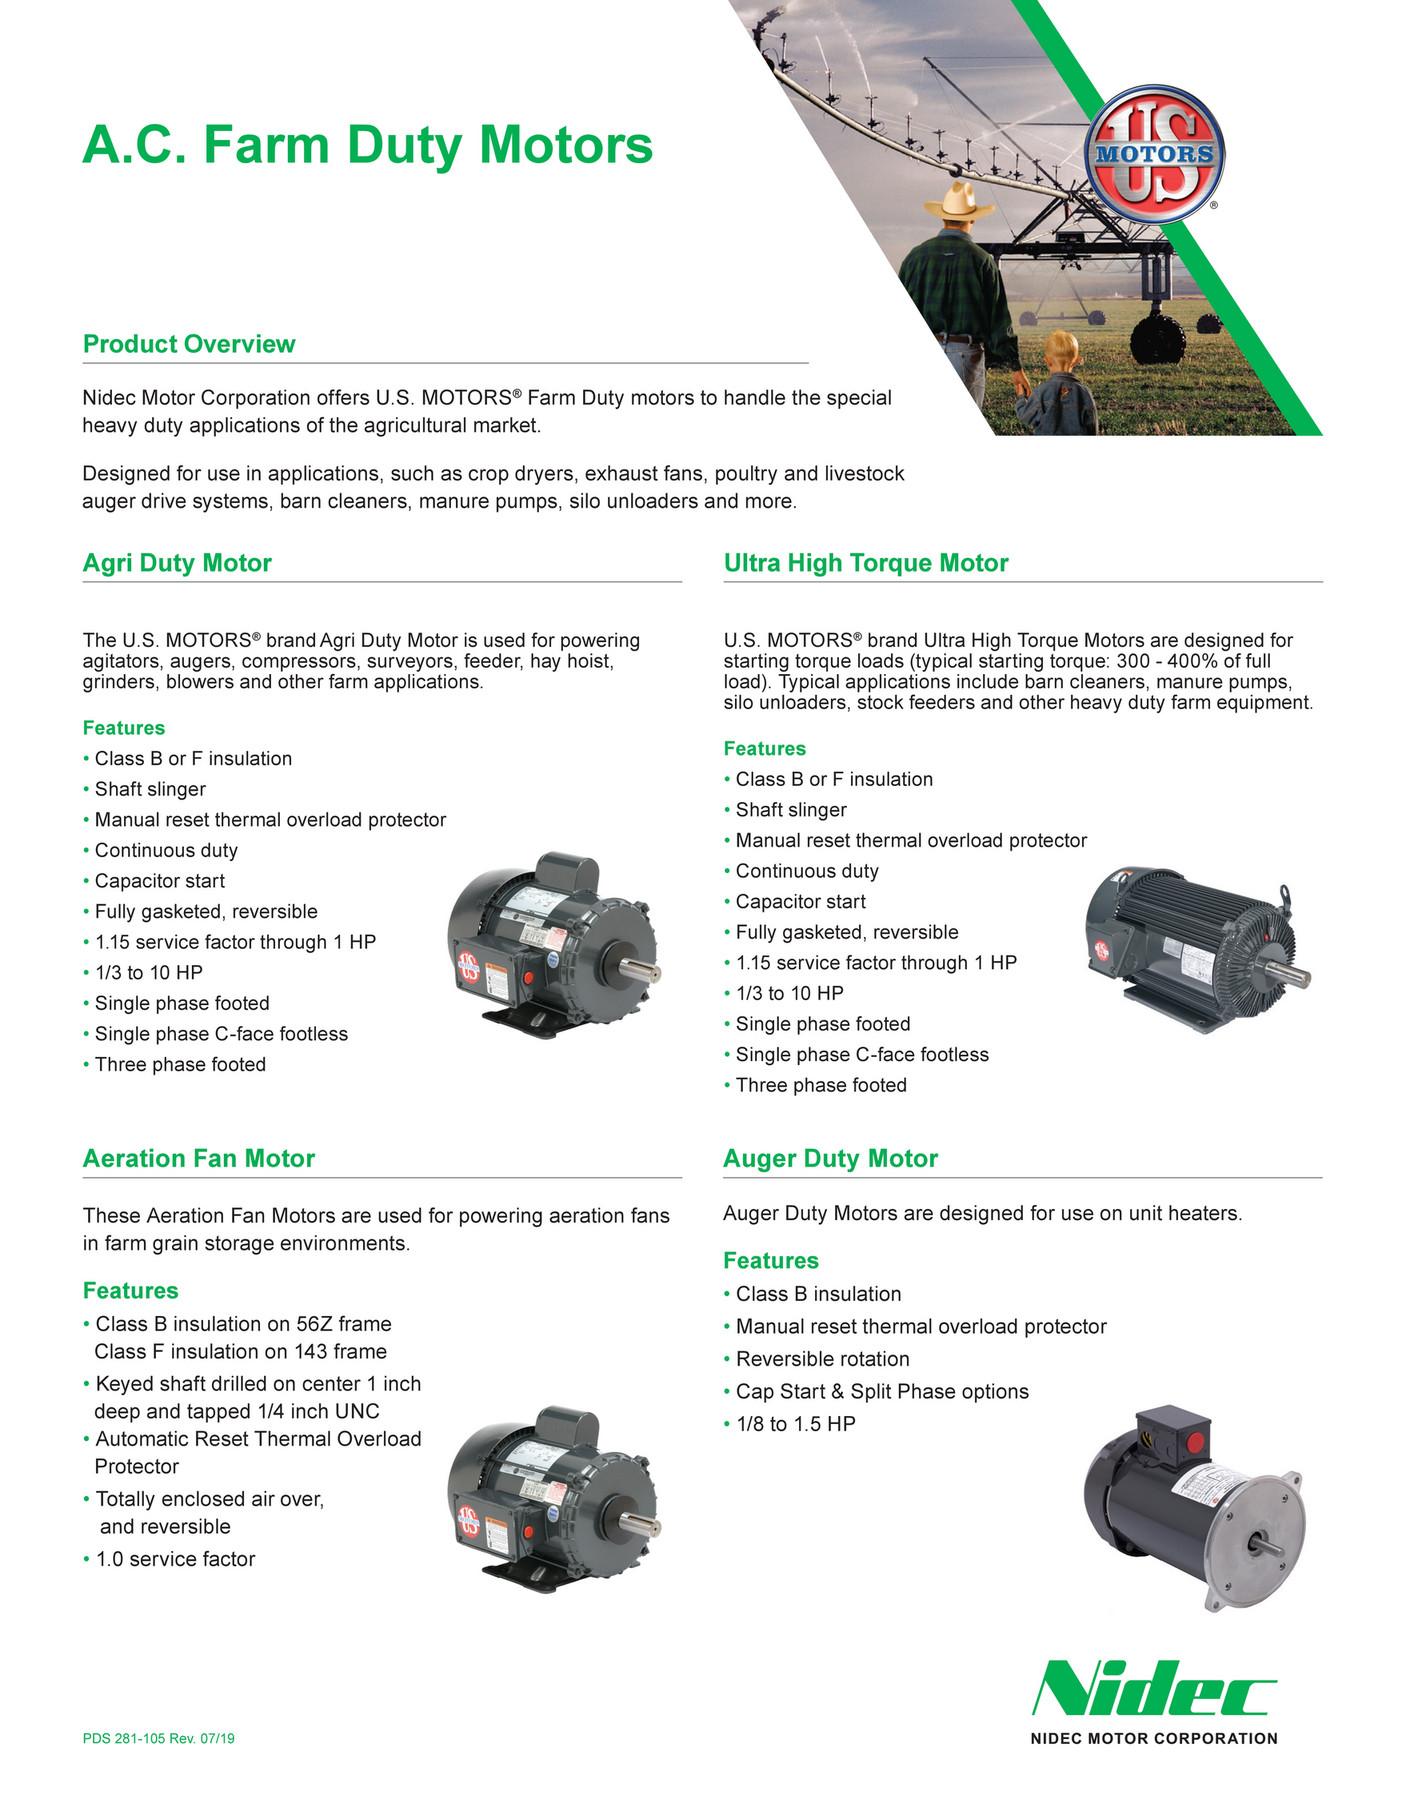 Kaman Distribution - Nidec AC Farm Duty Motors Brochure - Page 1